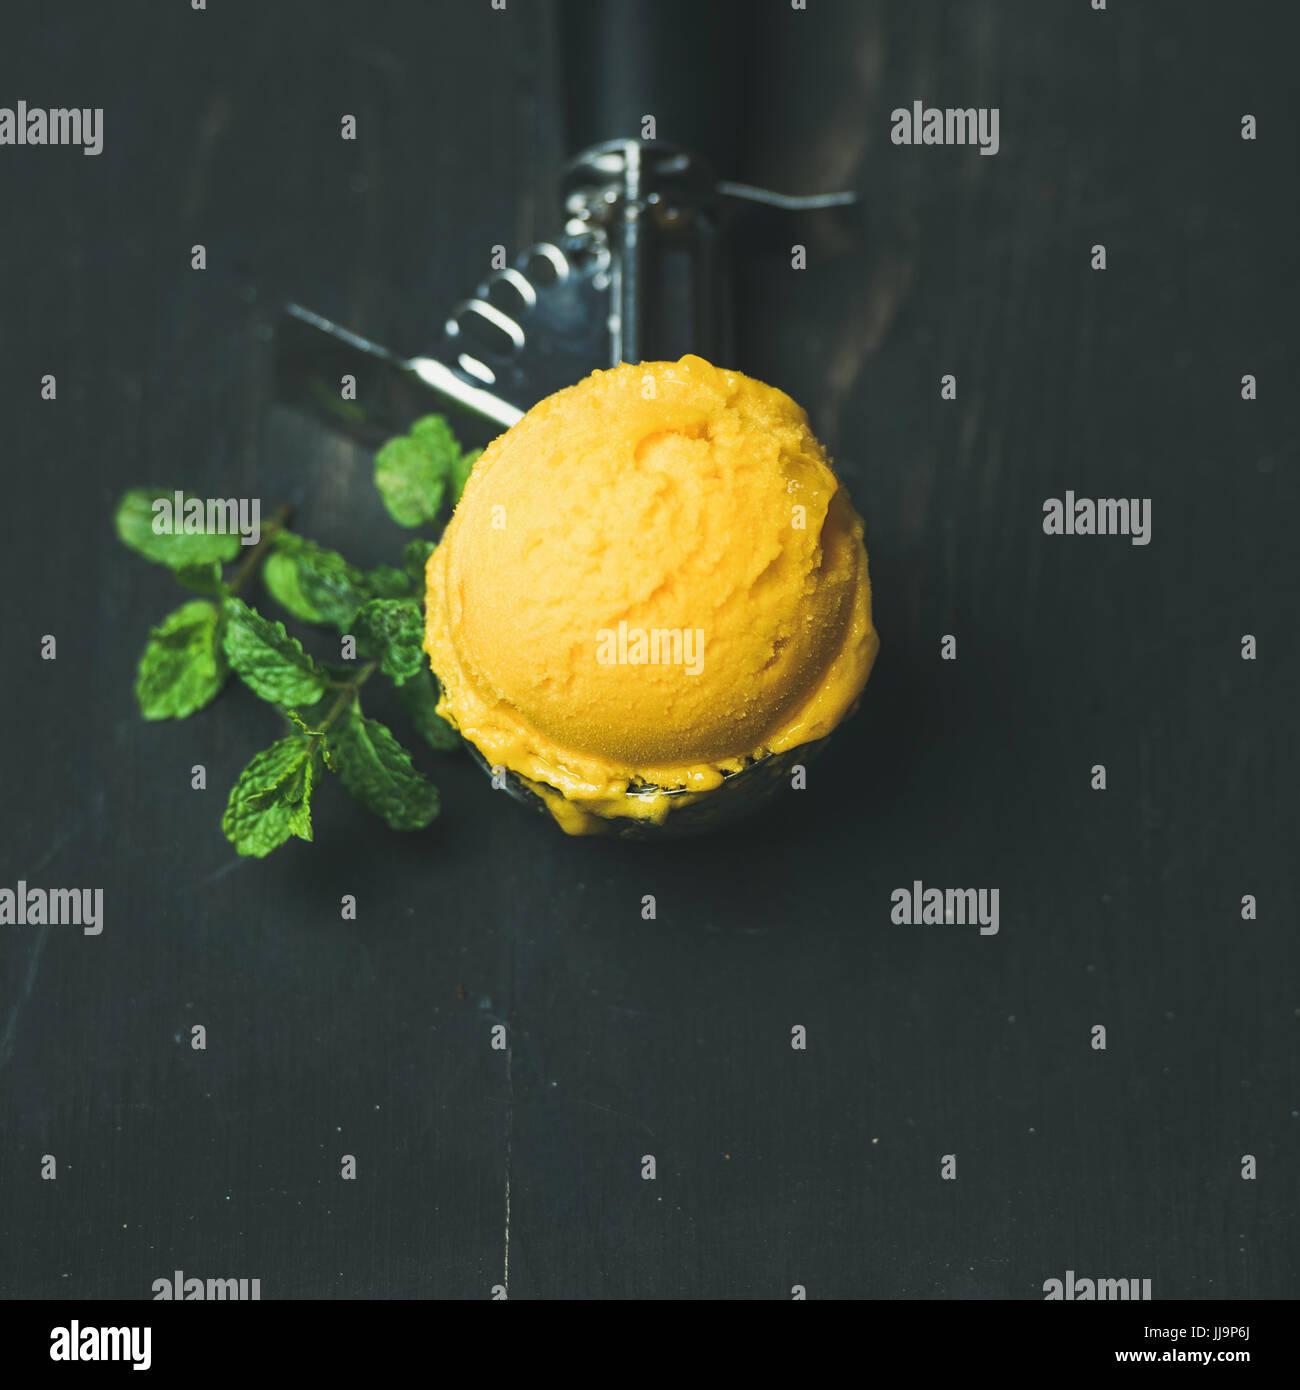 Mango sorbet ice cream scoop in scooper, square crop - Stock Image